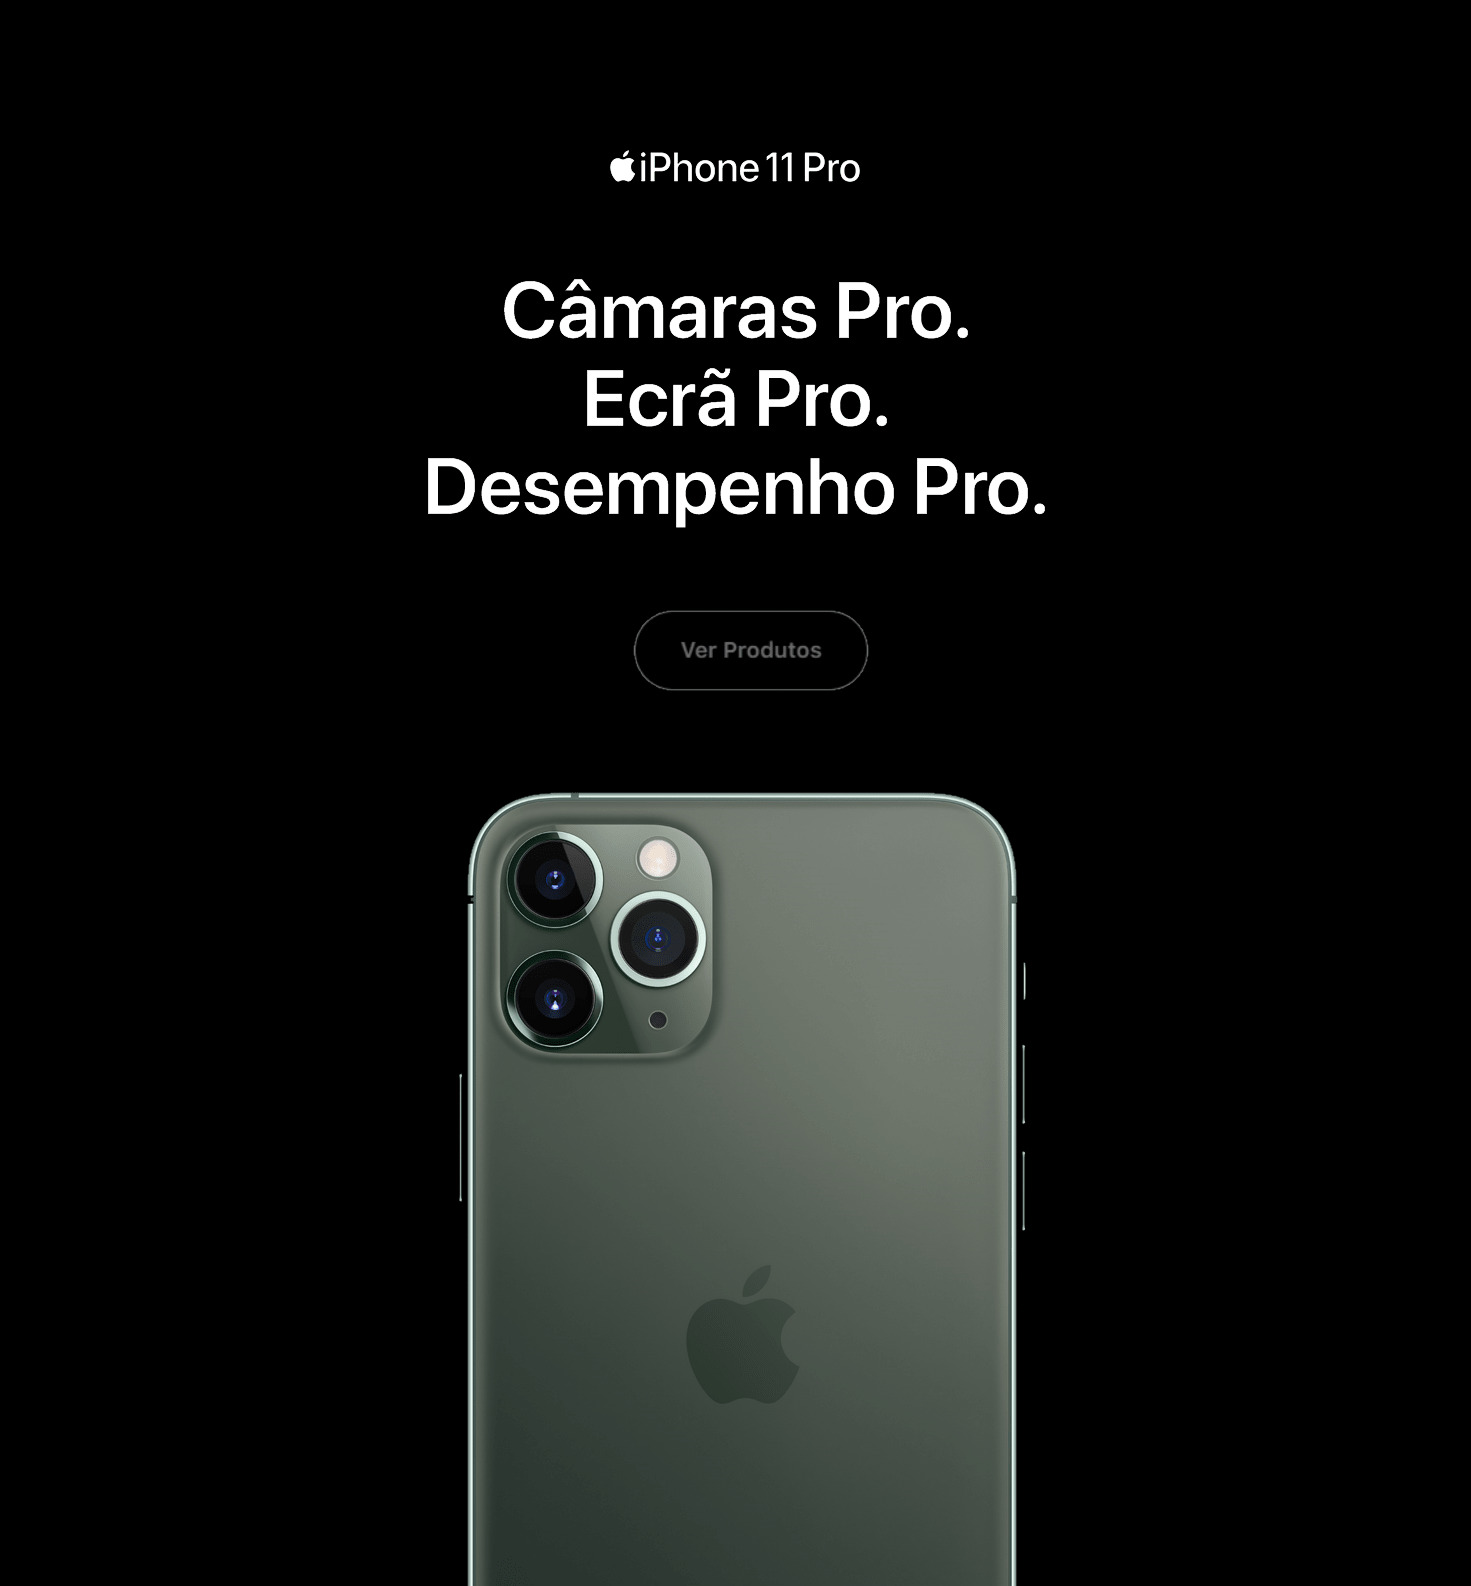 Iphone 11 Pro .Câmaras Pro. Ecrã Pro. Desempenho Pro.